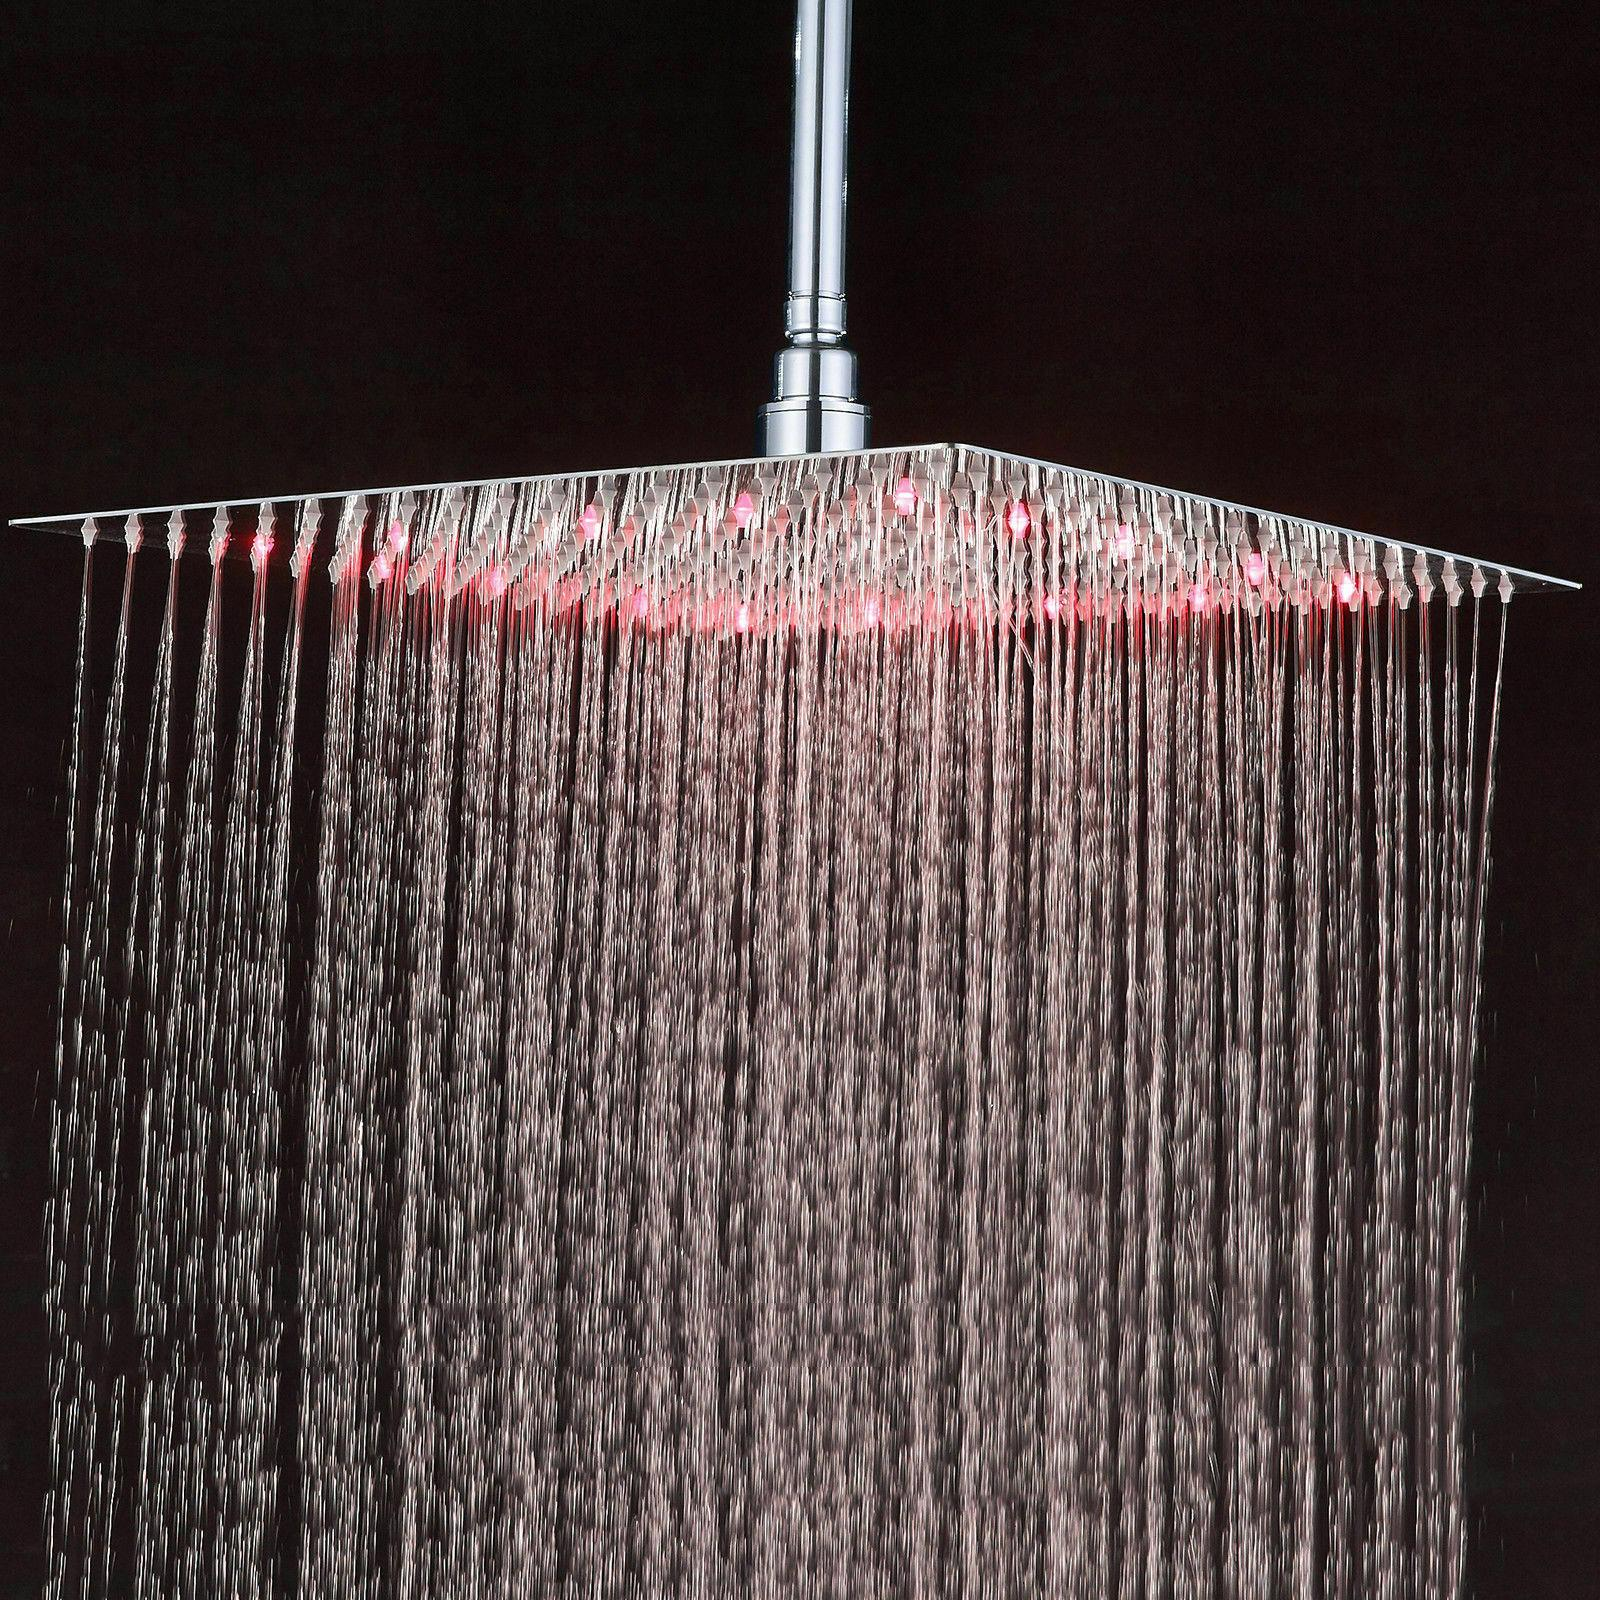 Shower Head Ultrathin Rotate